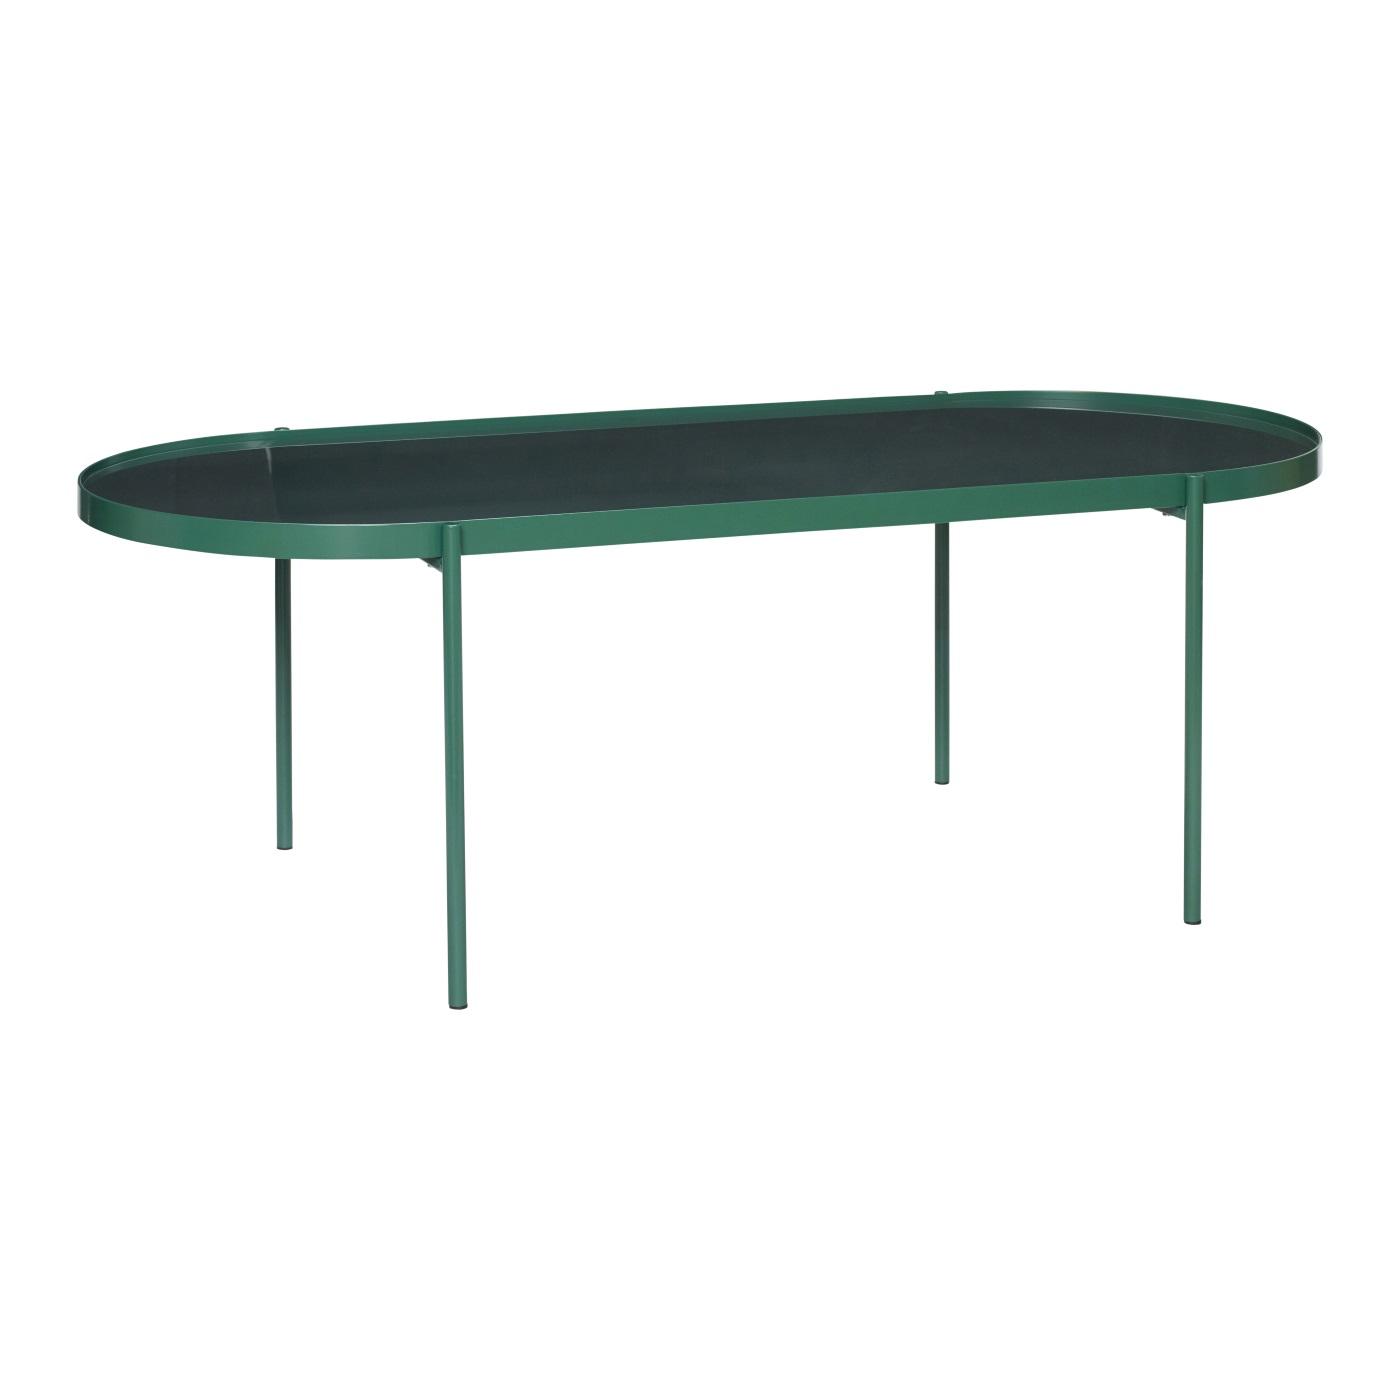 Soffbord avlångt grönt, Hubsch